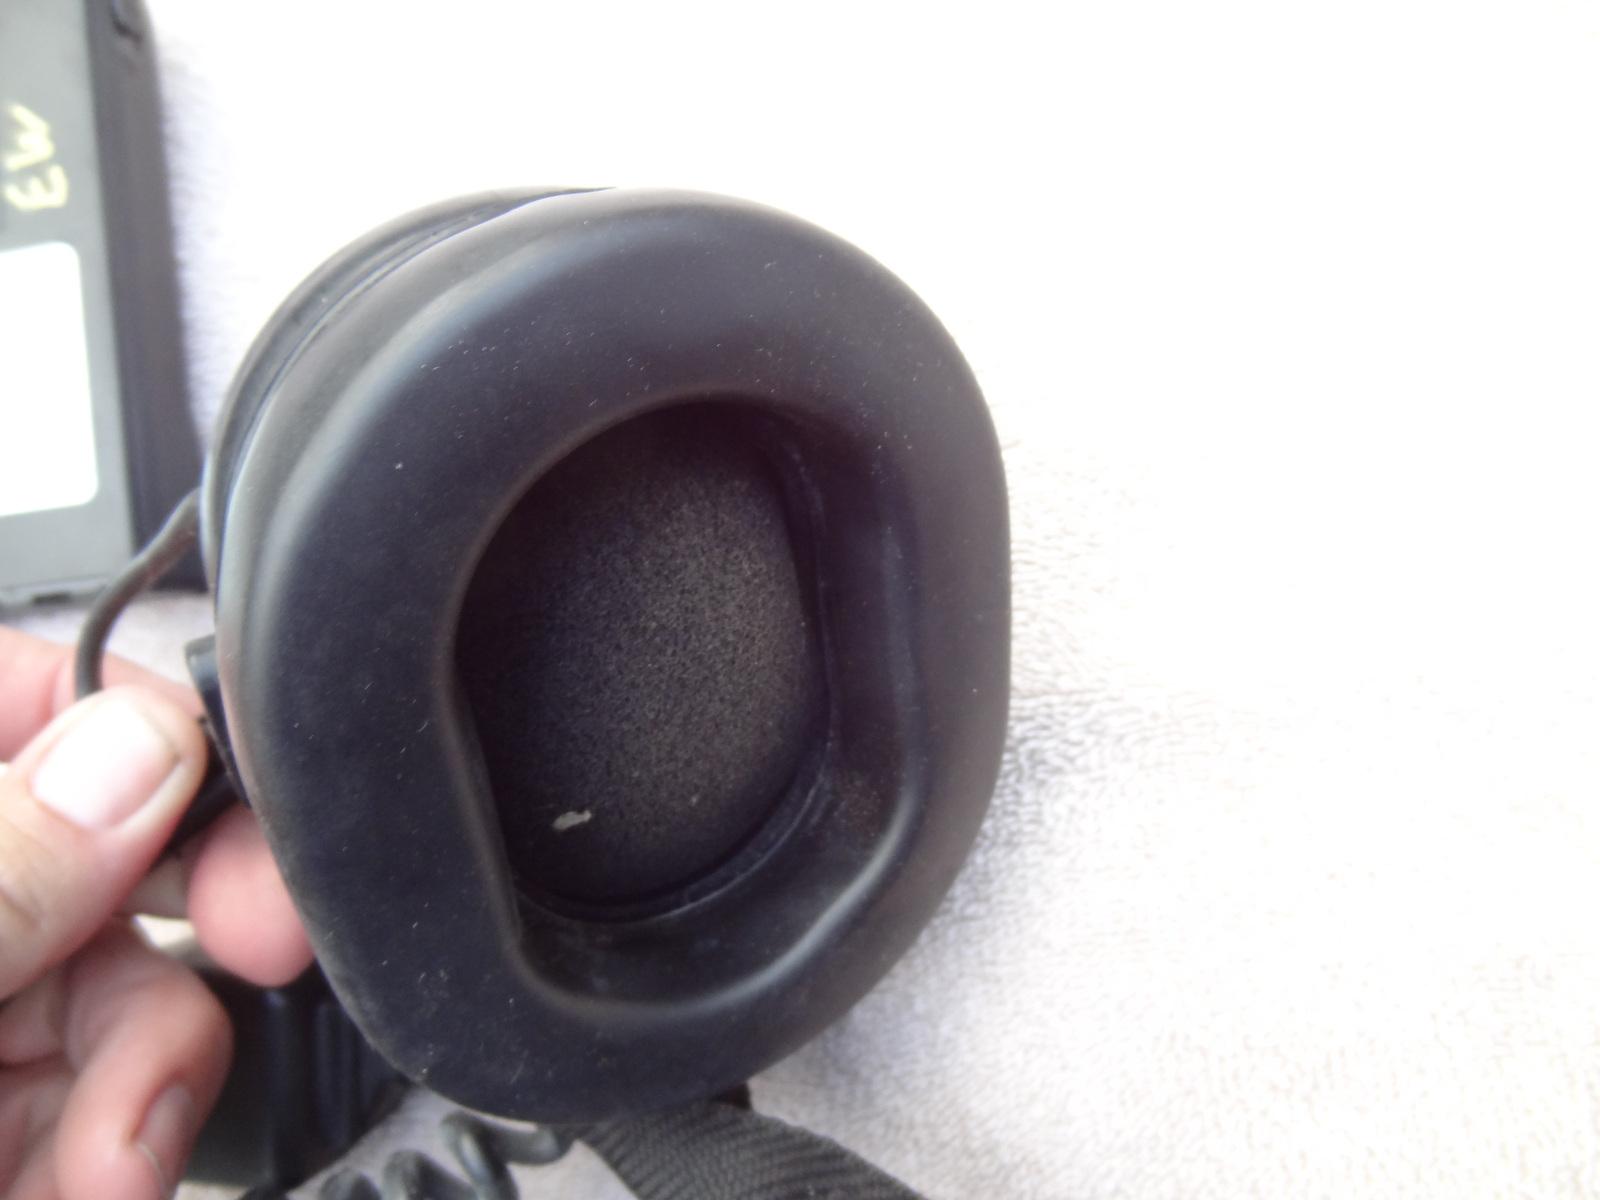 Motorola HNN9010A HT750 RLN4883B ENMN4016A and 50 similar items